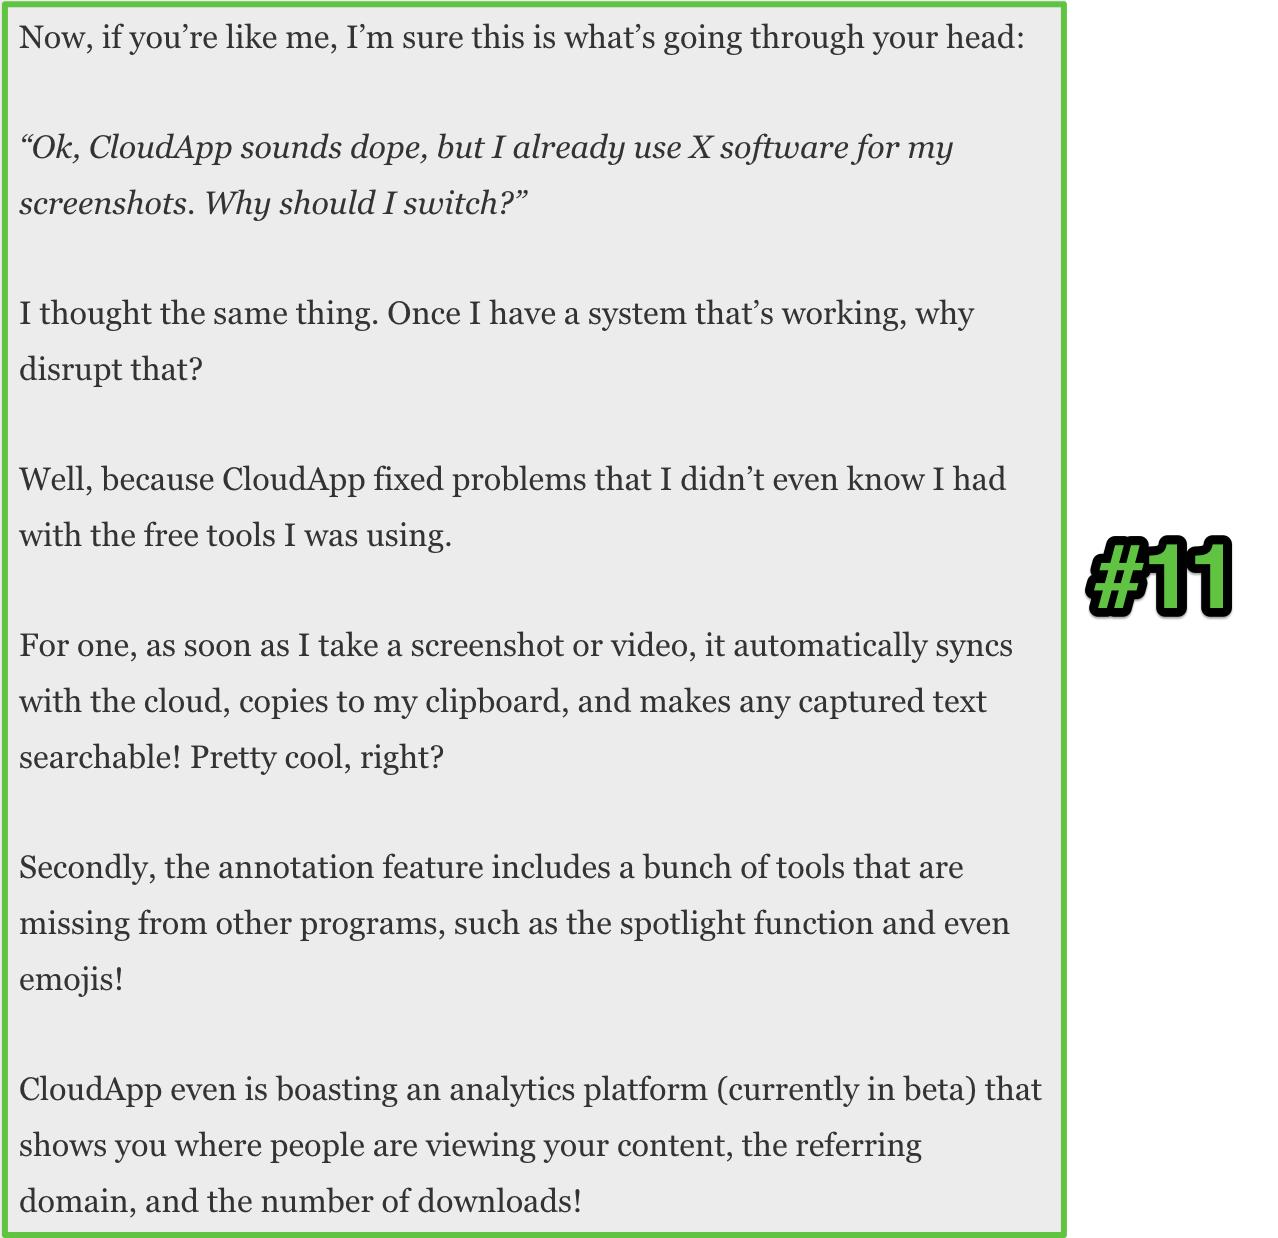 Screenshot showing copy about CloudApp